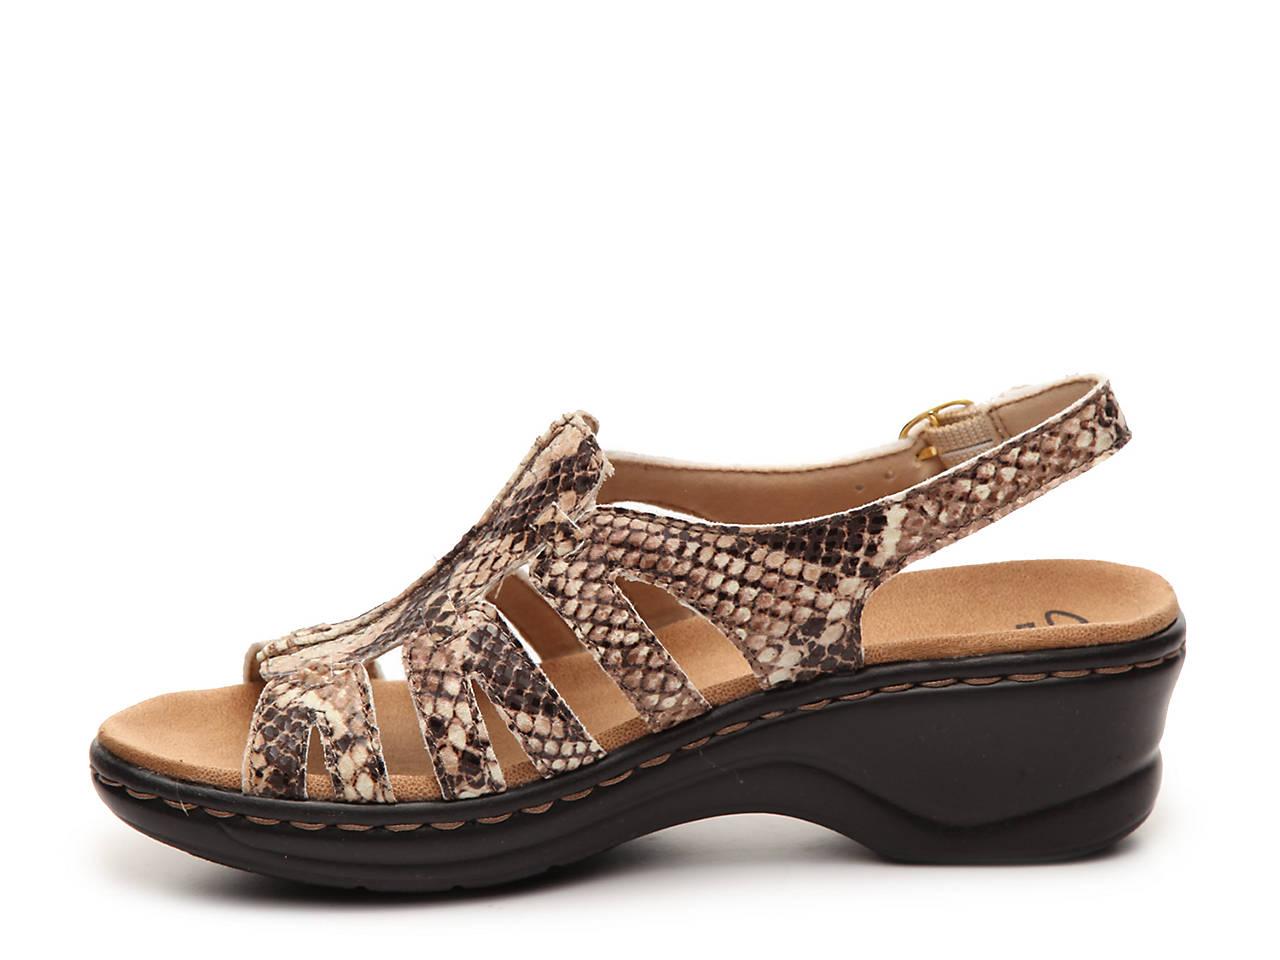 Clarks Lexi Marigold Wedge Sandal Women S Shoes Dsw